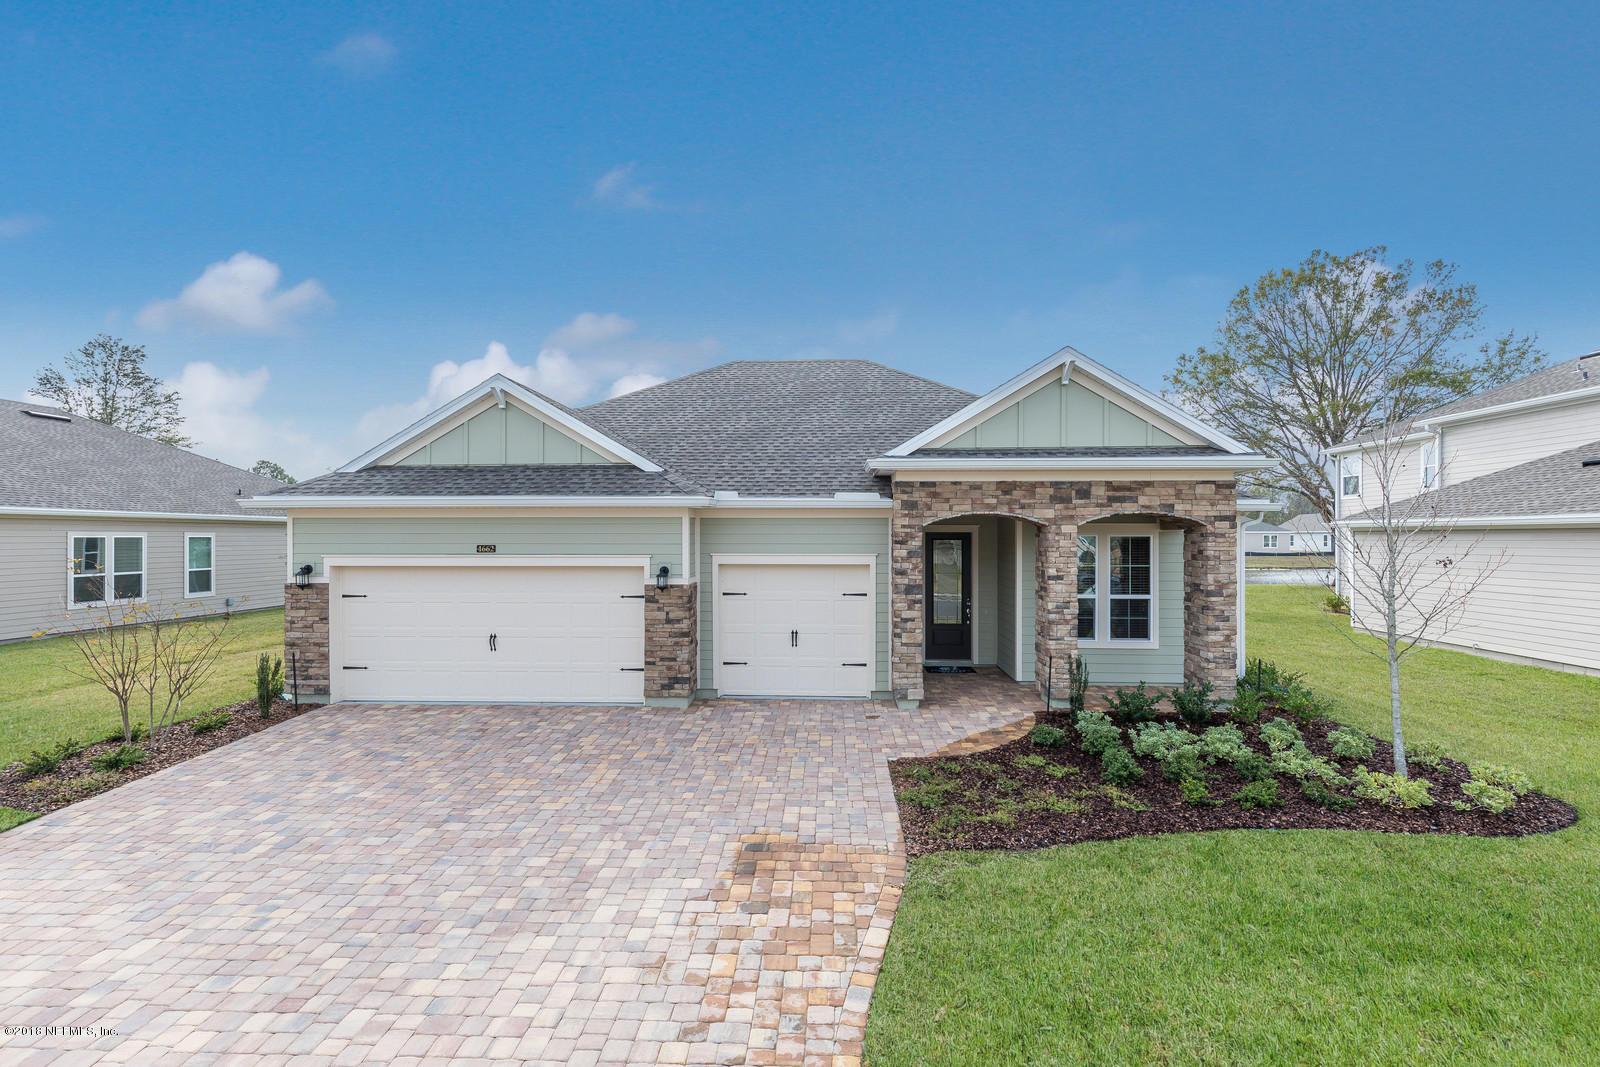 2931 LAS CALINAS, ST AUGUSTINE, FLORIDA 32095, 4 Bedrooms Bedrooms, ,3 BathroomsBathrooms,Residential - single family,For sale,LAS CALINAS,957988